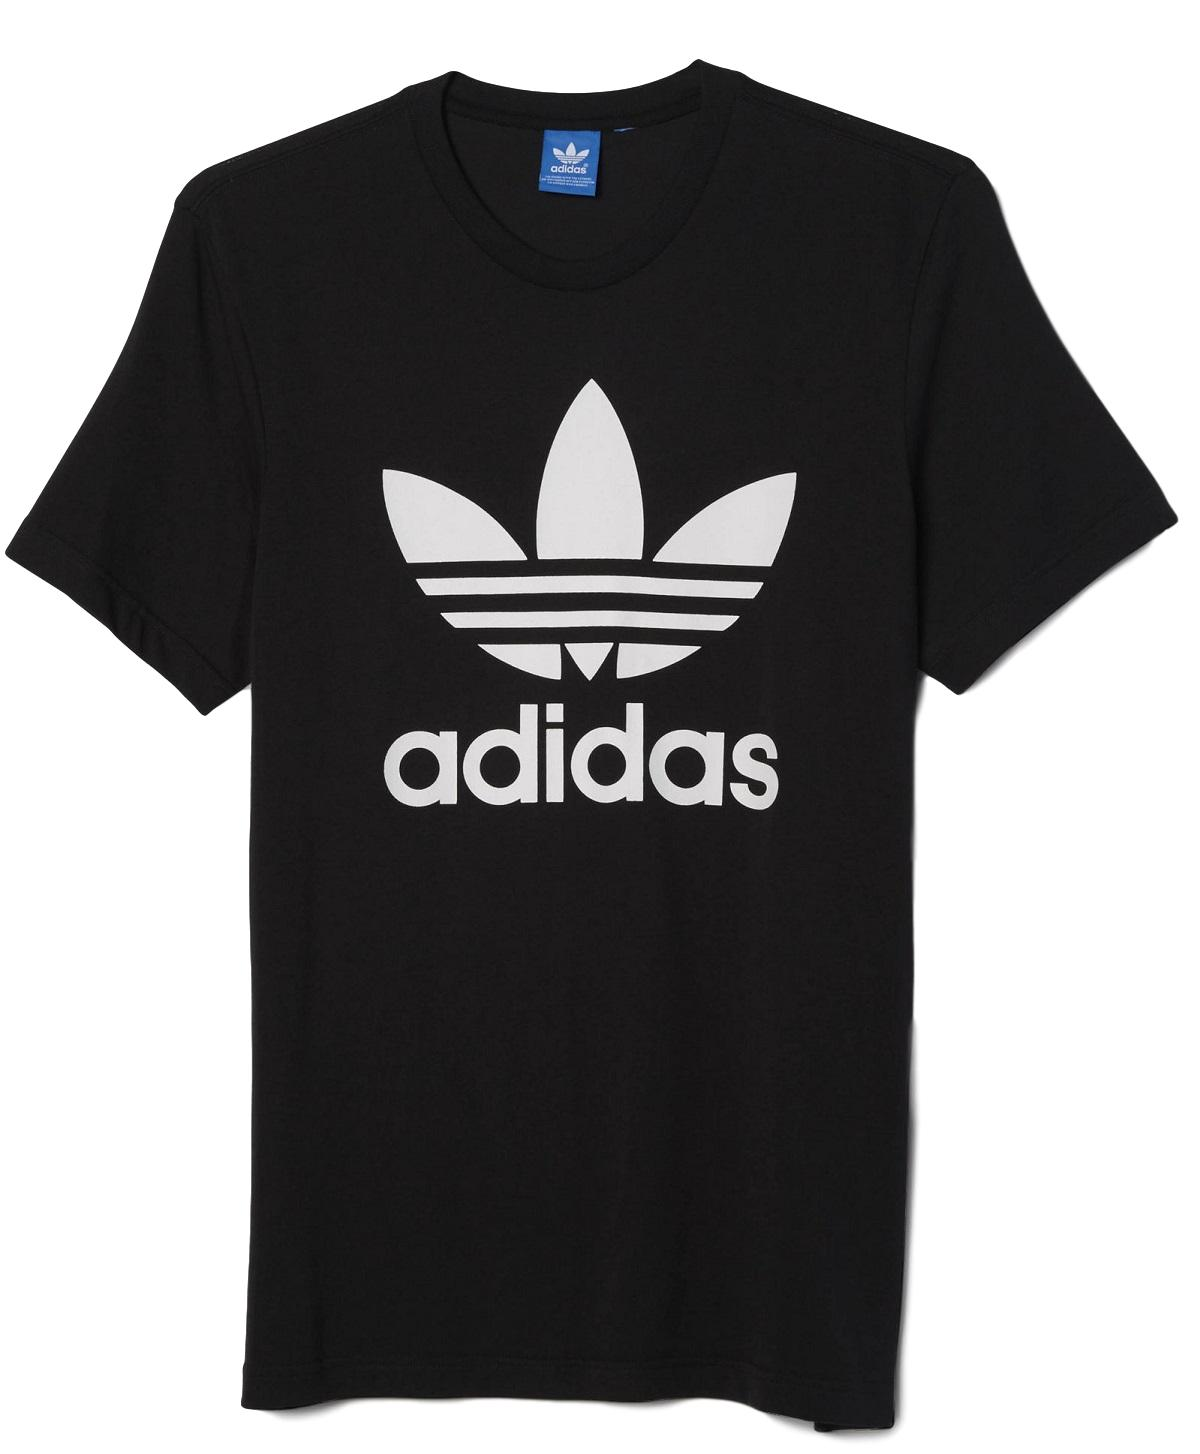 New Men's Adidas Original Authentic Trefoil Logo Tee Shirt T-Shirt Crewneck Graphic Black